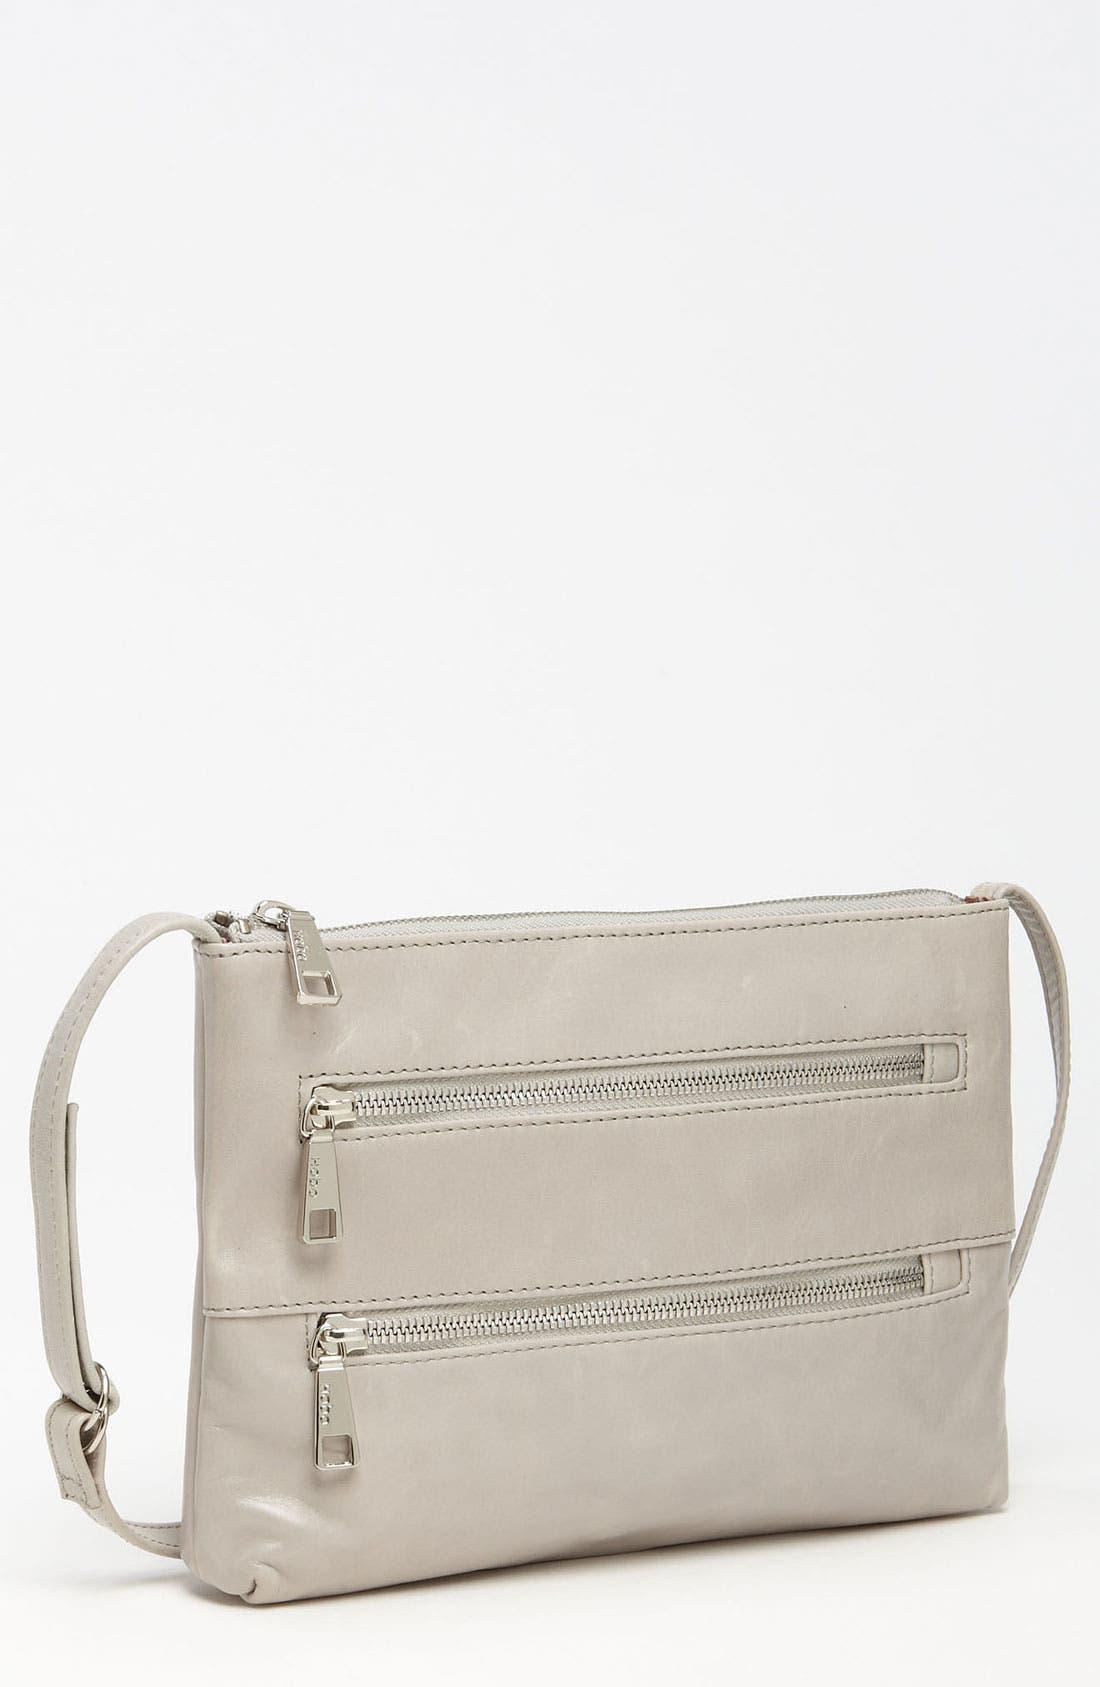 Alternate Image 1 Selected - Hobo 'Mara' Crossbody Bag